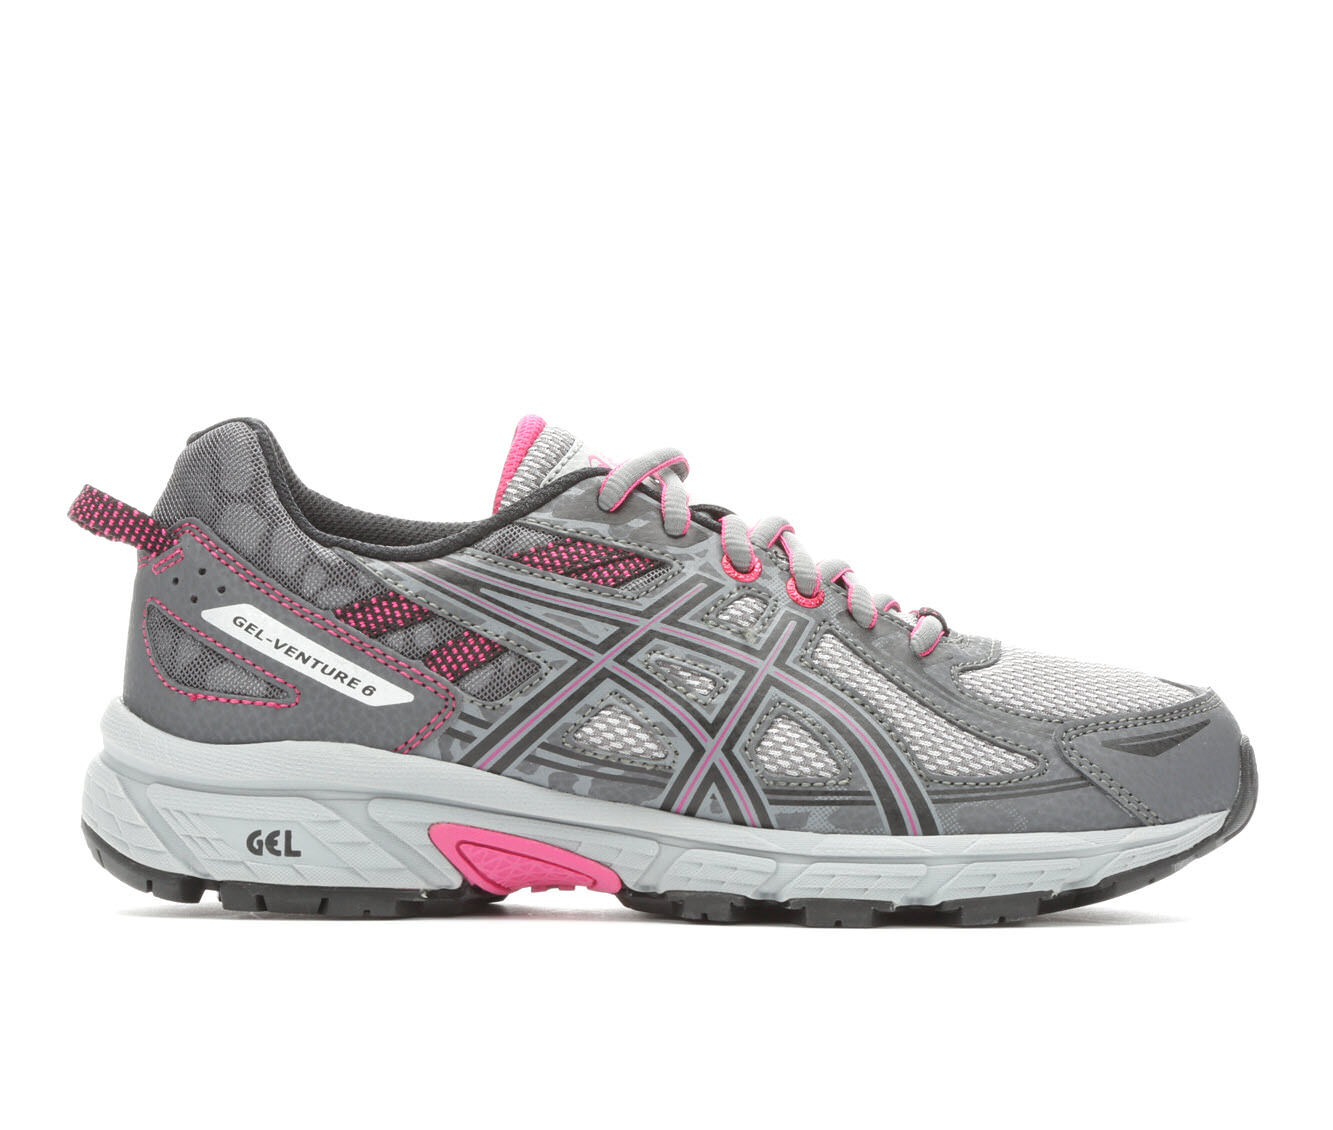 Quality Guarantee Women's ASICS Gel Venture 6 Trail Running Shoes Grey/Black/Pink